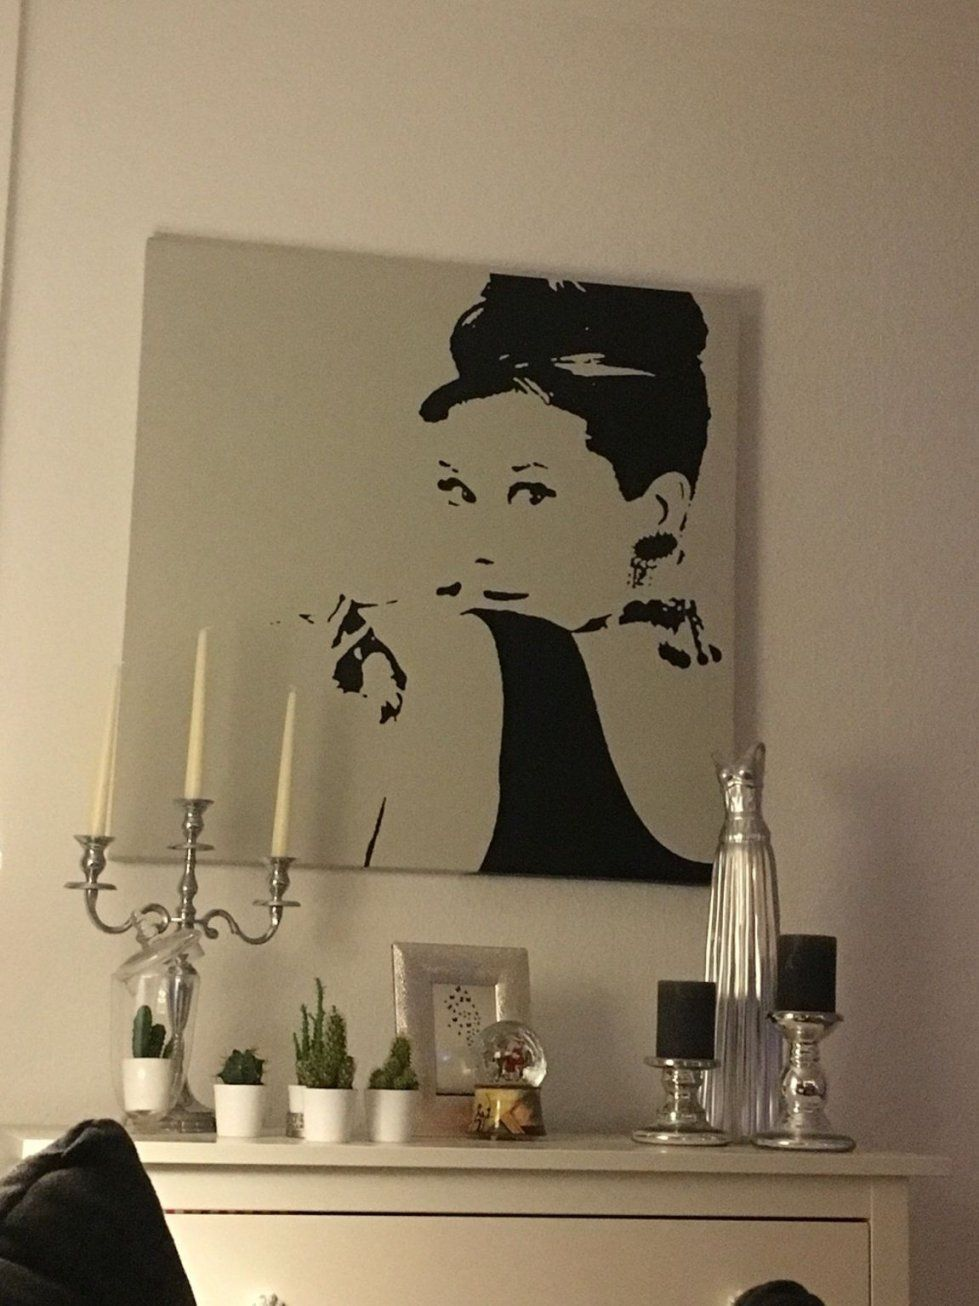 Gebraucht Audrey Hepburn Bild Ikea Leinwand Schwarz In 23843 Bad von Audrey Hepburn Bild Ikea Photo